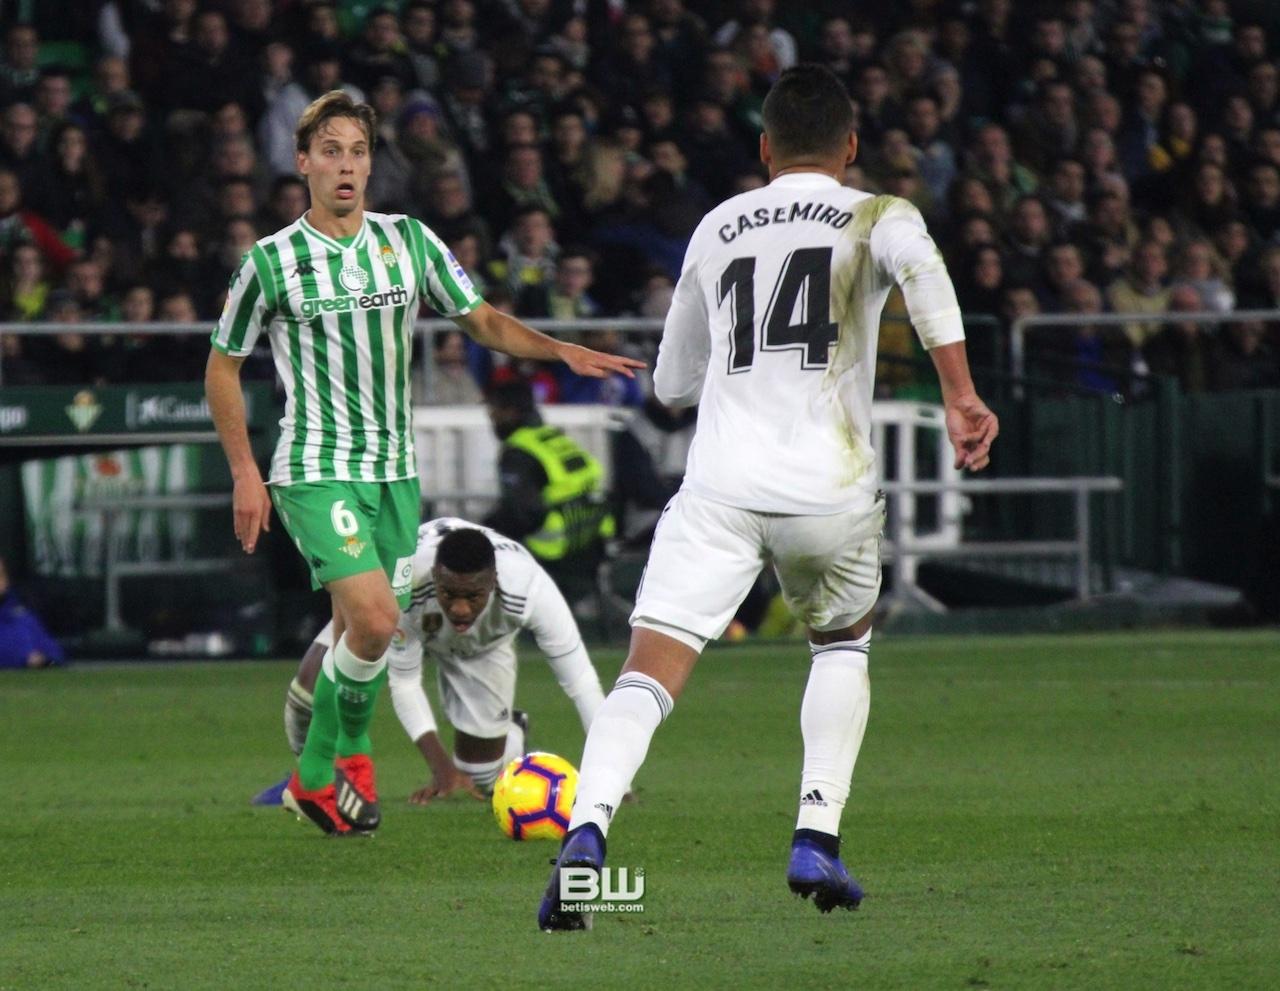 J19 - Betis - Madrid (79)